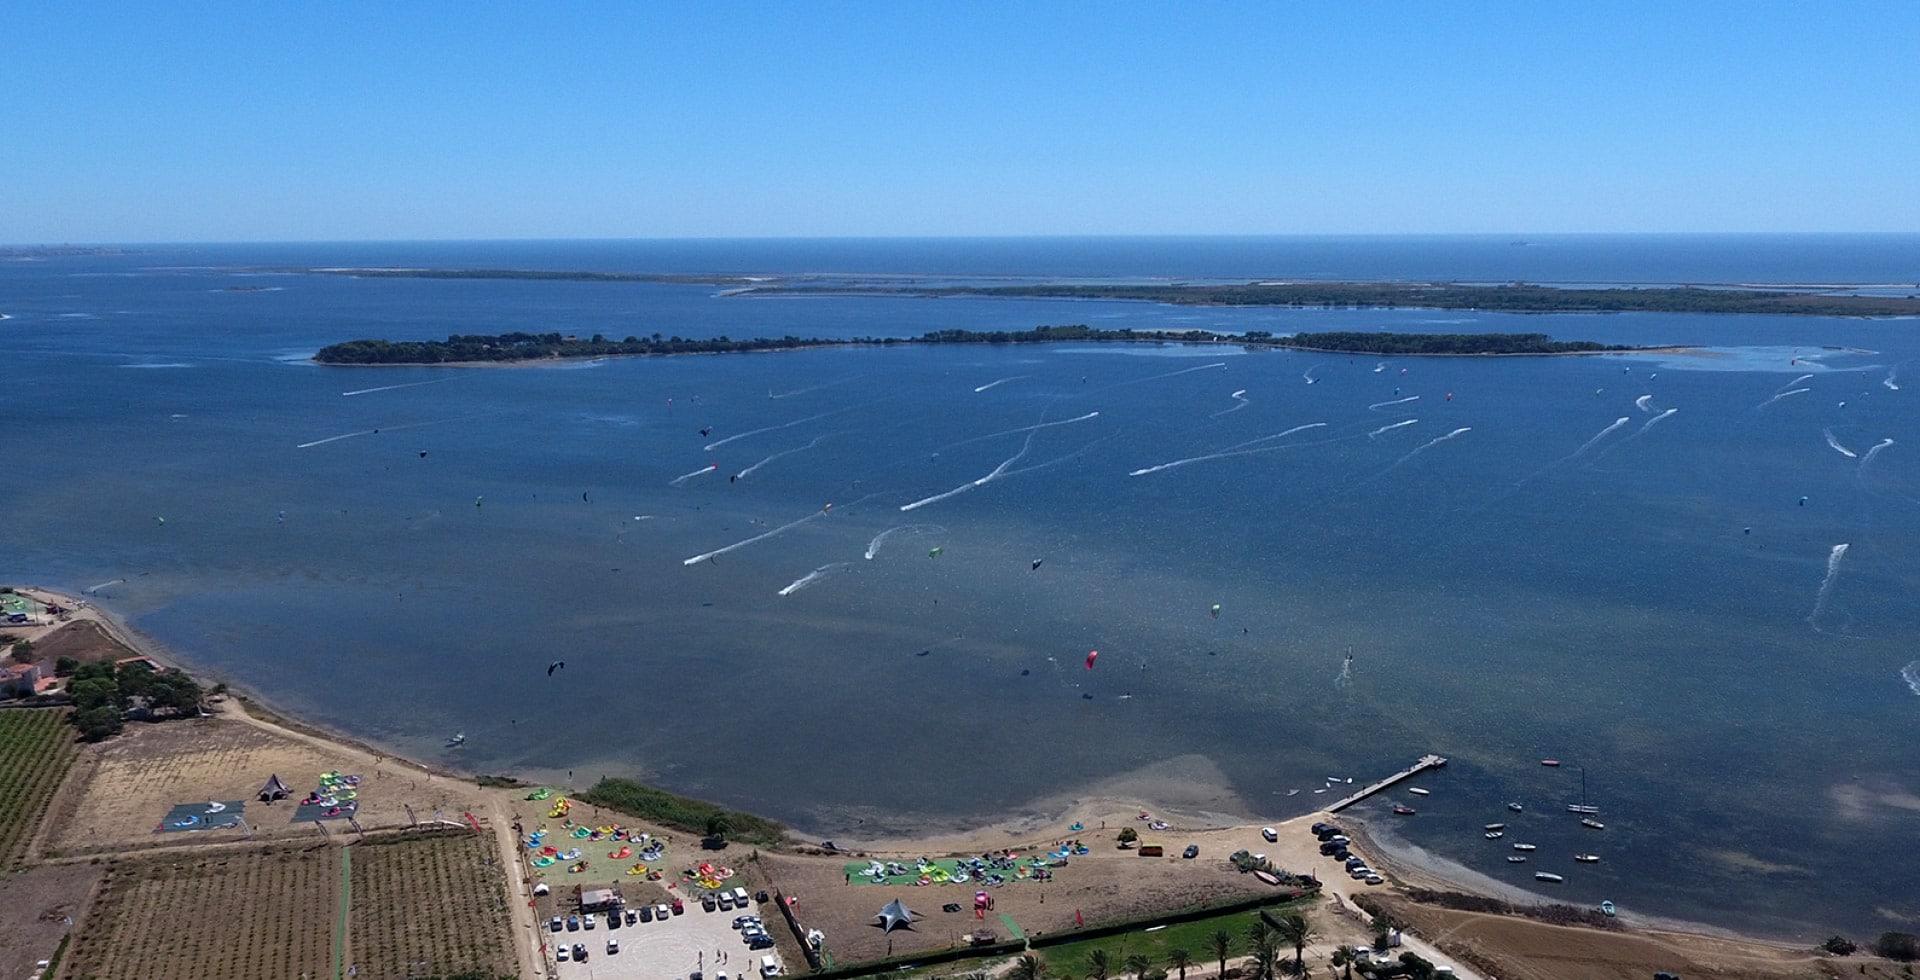 kitesurfen-Lo-Stagnone-lagune-Schule-Anfänger-Kurse-Unterkunft-Kitelagune-Marsala-north-duotone-ozone-Kiteboarding-Flow-Kiteschule-Siczilien-Kitecenter-Drohne